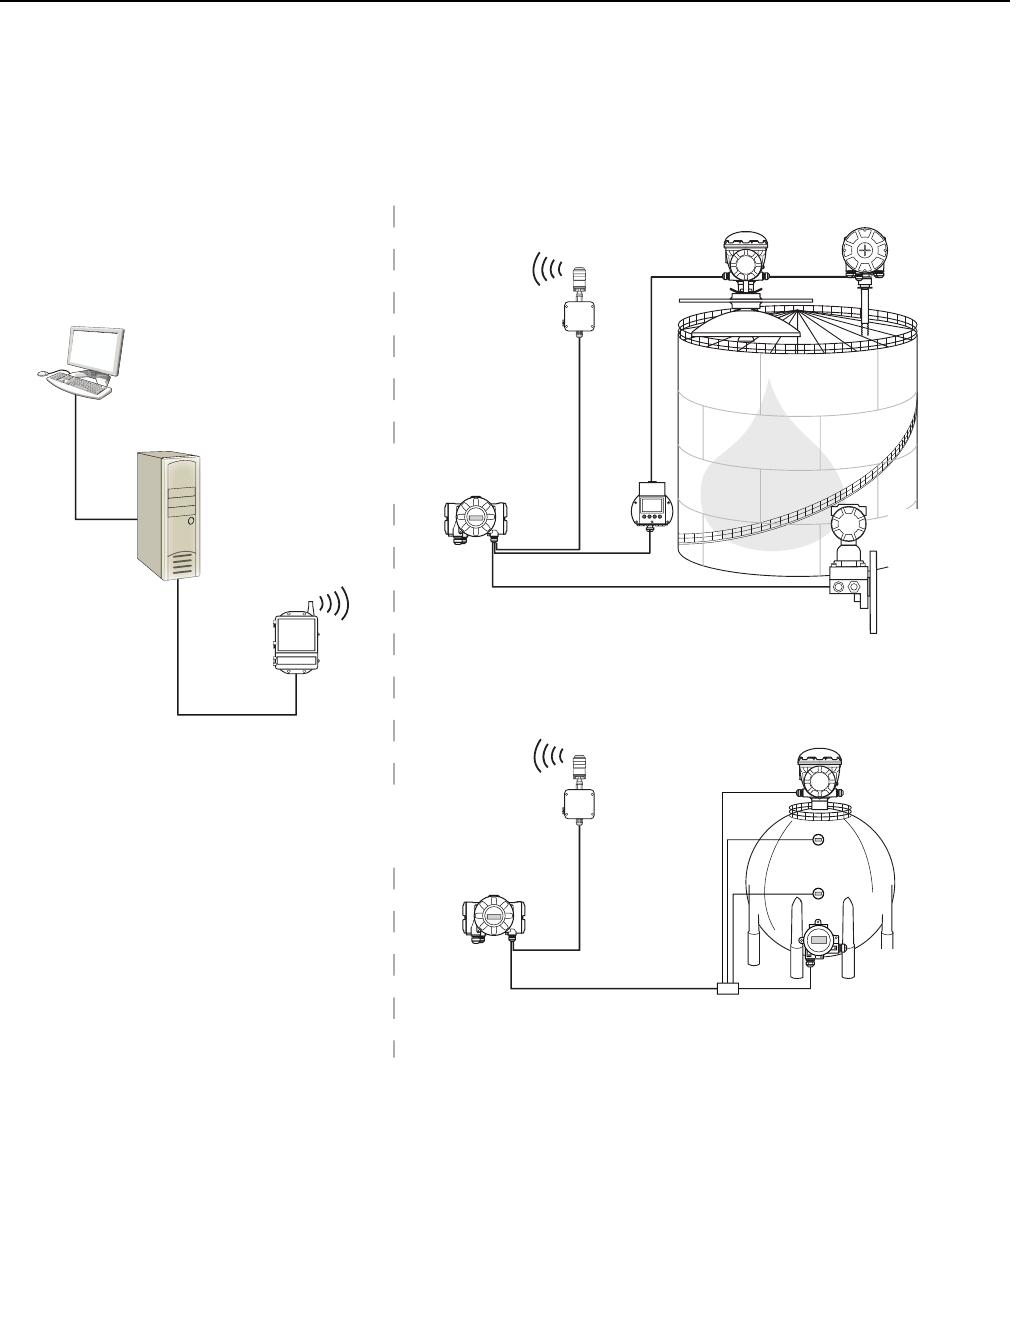 Emerson 2230 User Manual 06f8fc28 5d74 4088 ab39 2492b48d6d6f